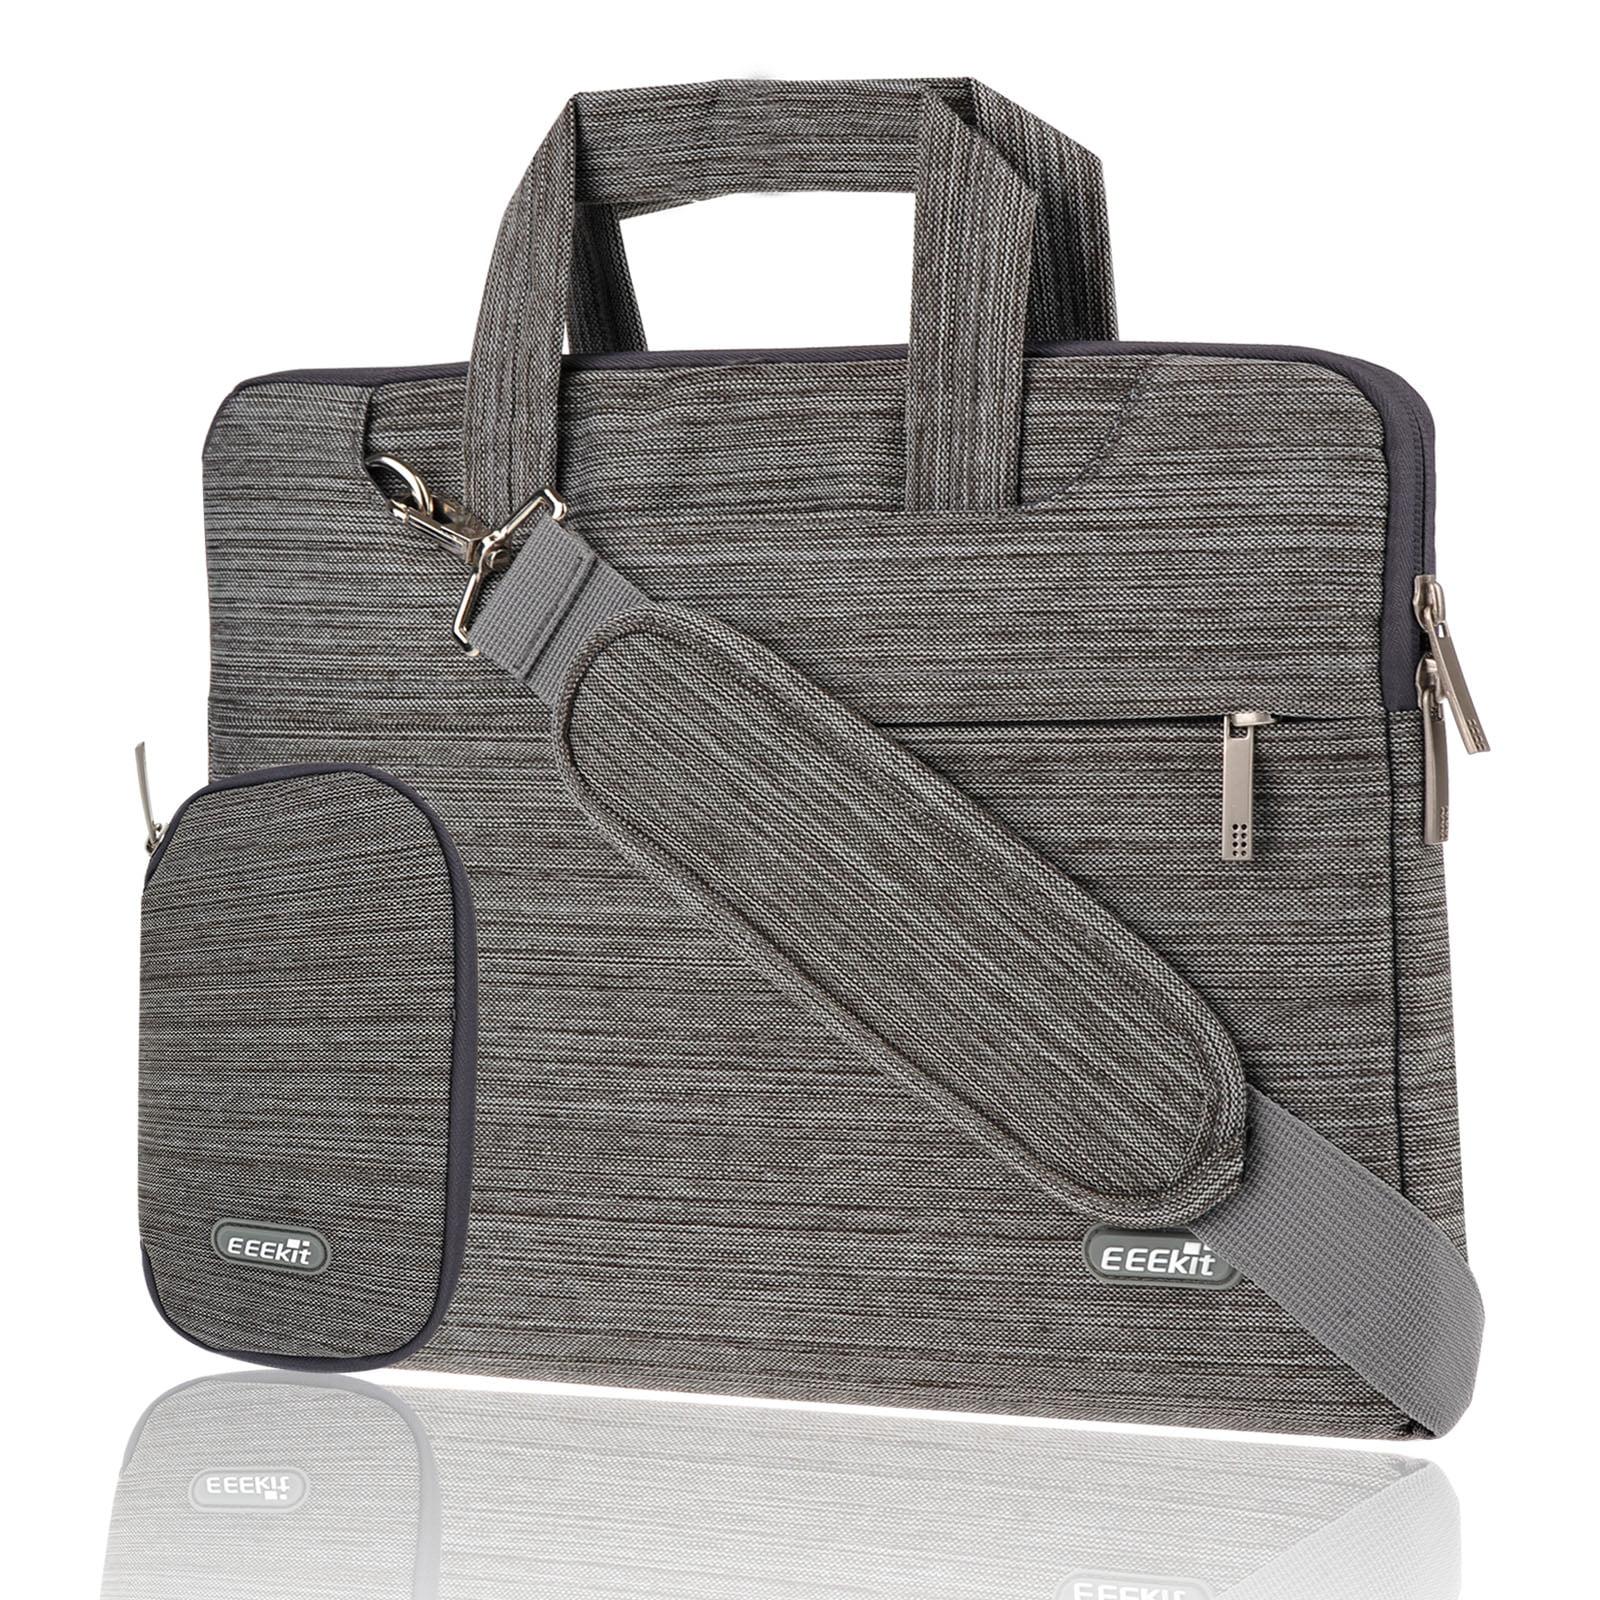 EEEKit Univesal 11.6 inch Laptop Shoulder Handle Sleeve Bag Briefcase Carrying Case for MacBook HP Acer ASUS Lenove Dell